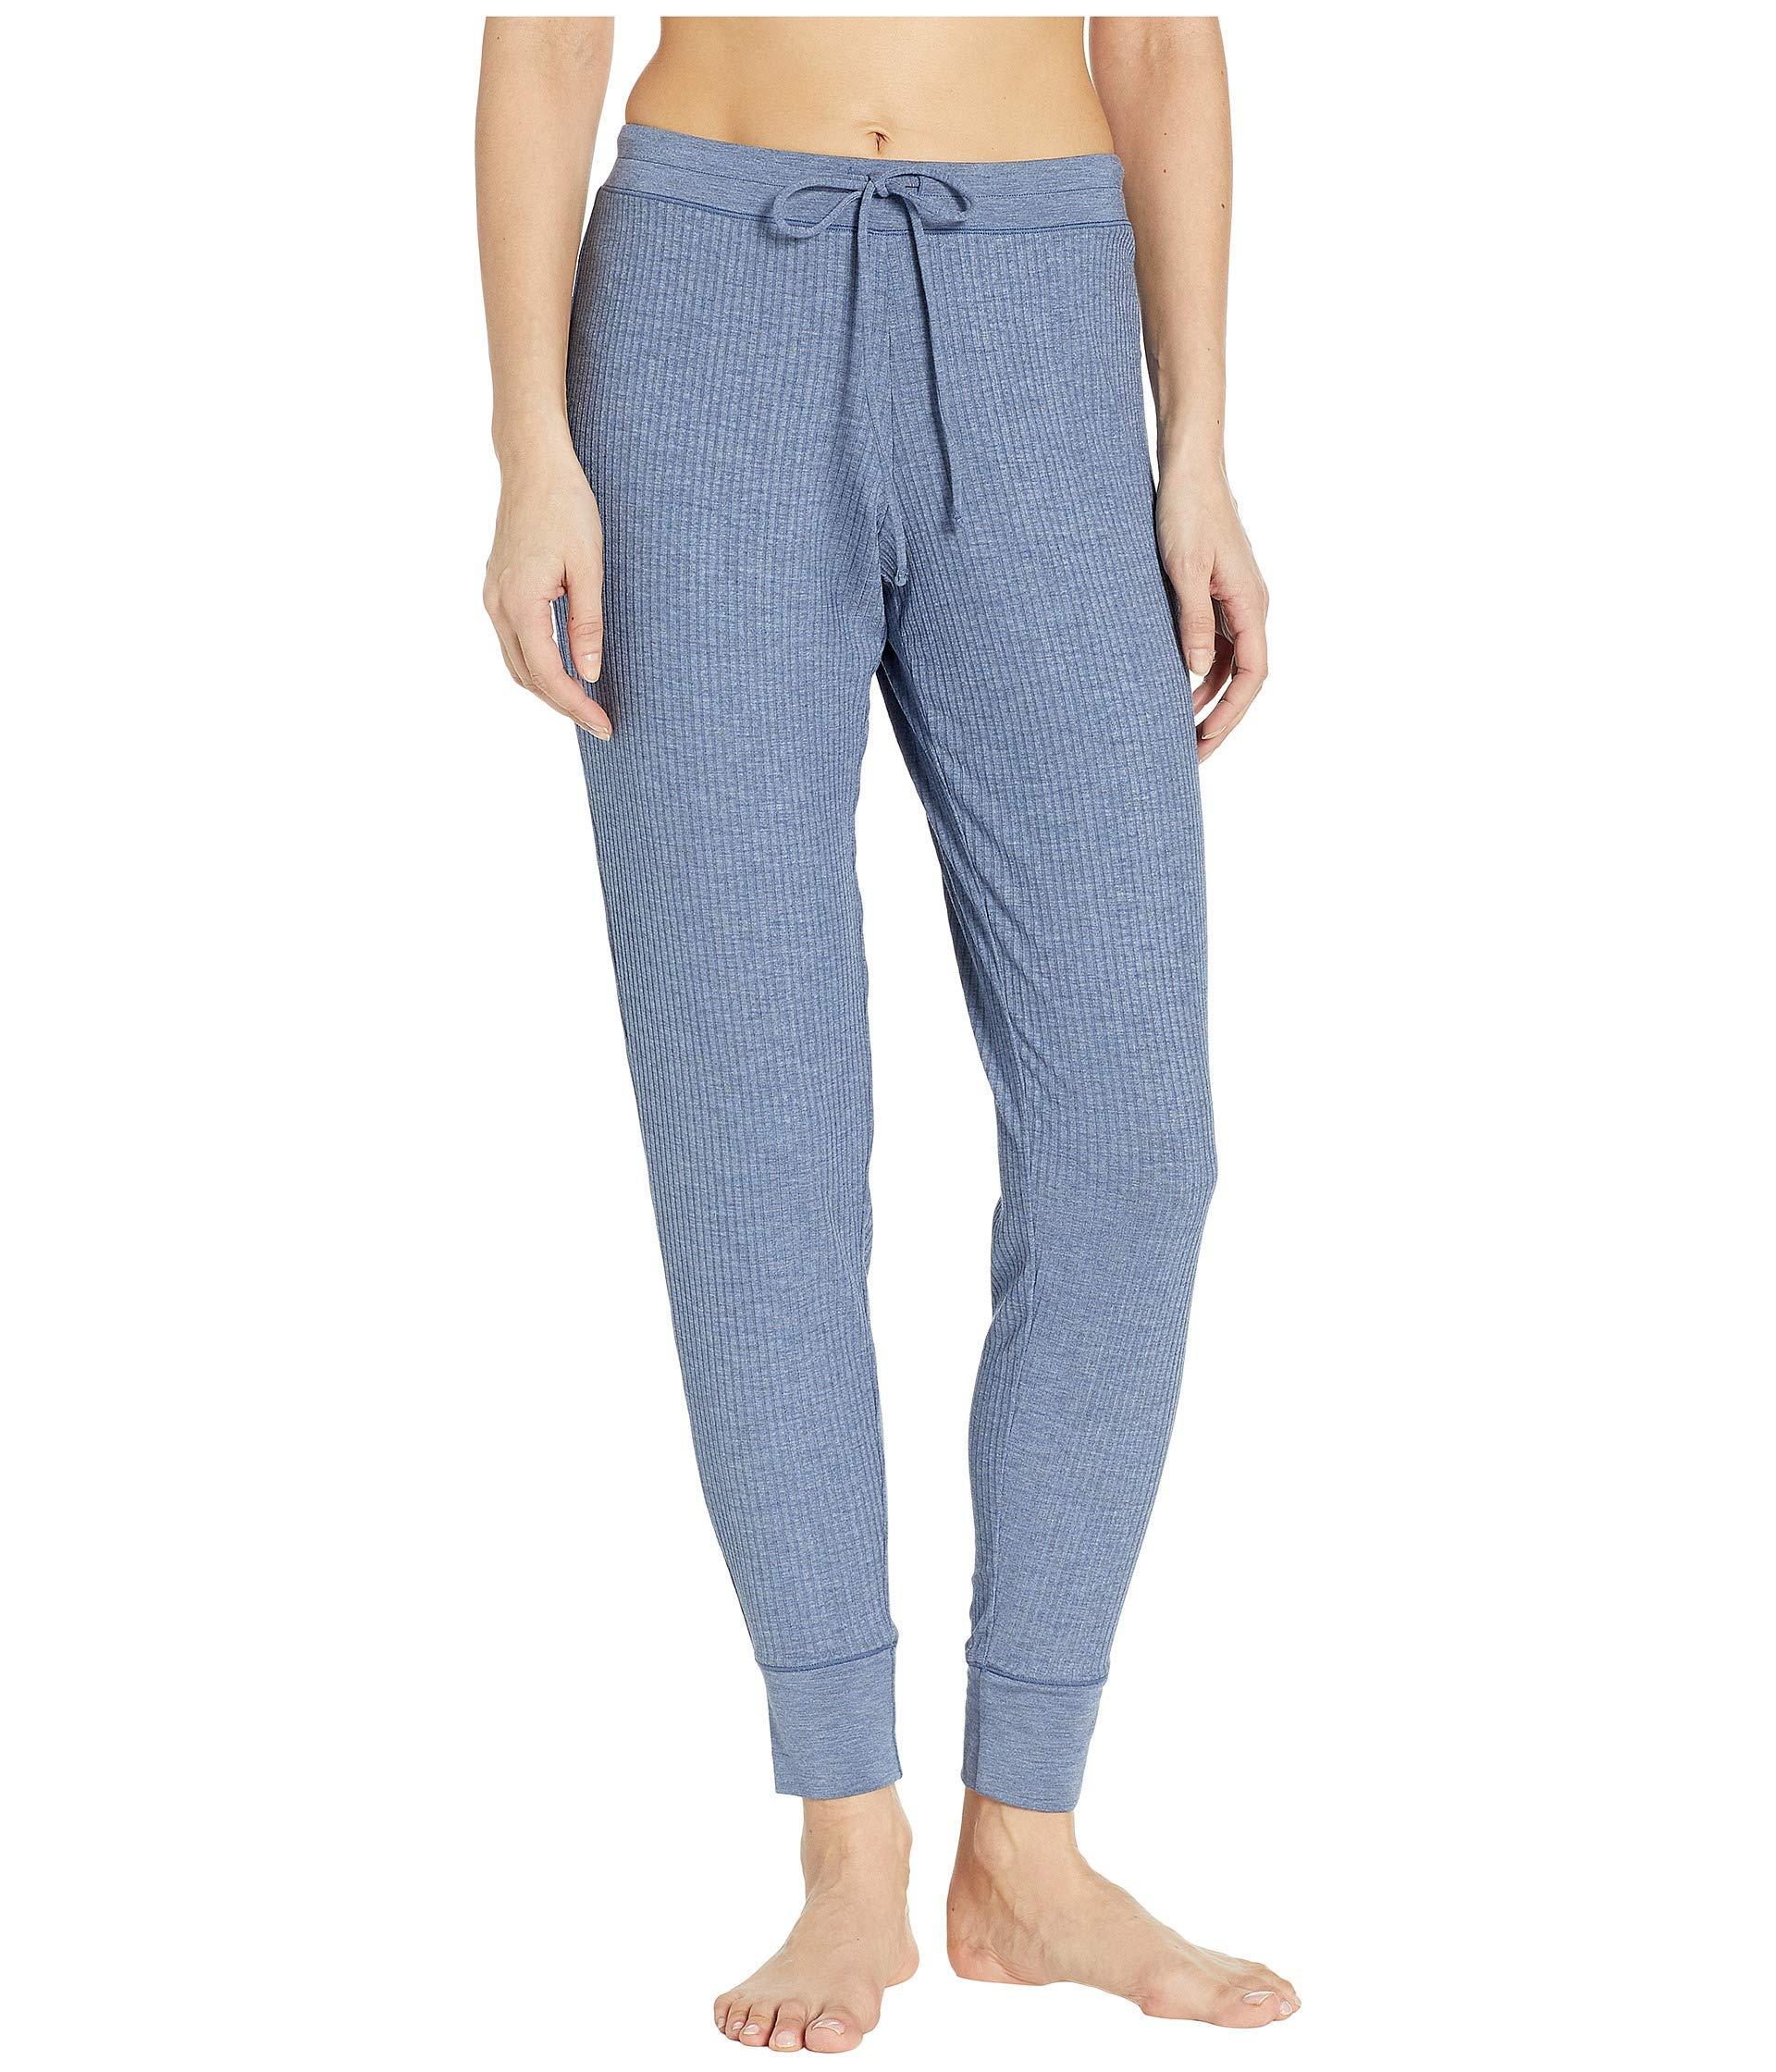 a8fa6e0255 Lyst - Felina Elements Jogger (heather Grey) Women's Pajama in Blue